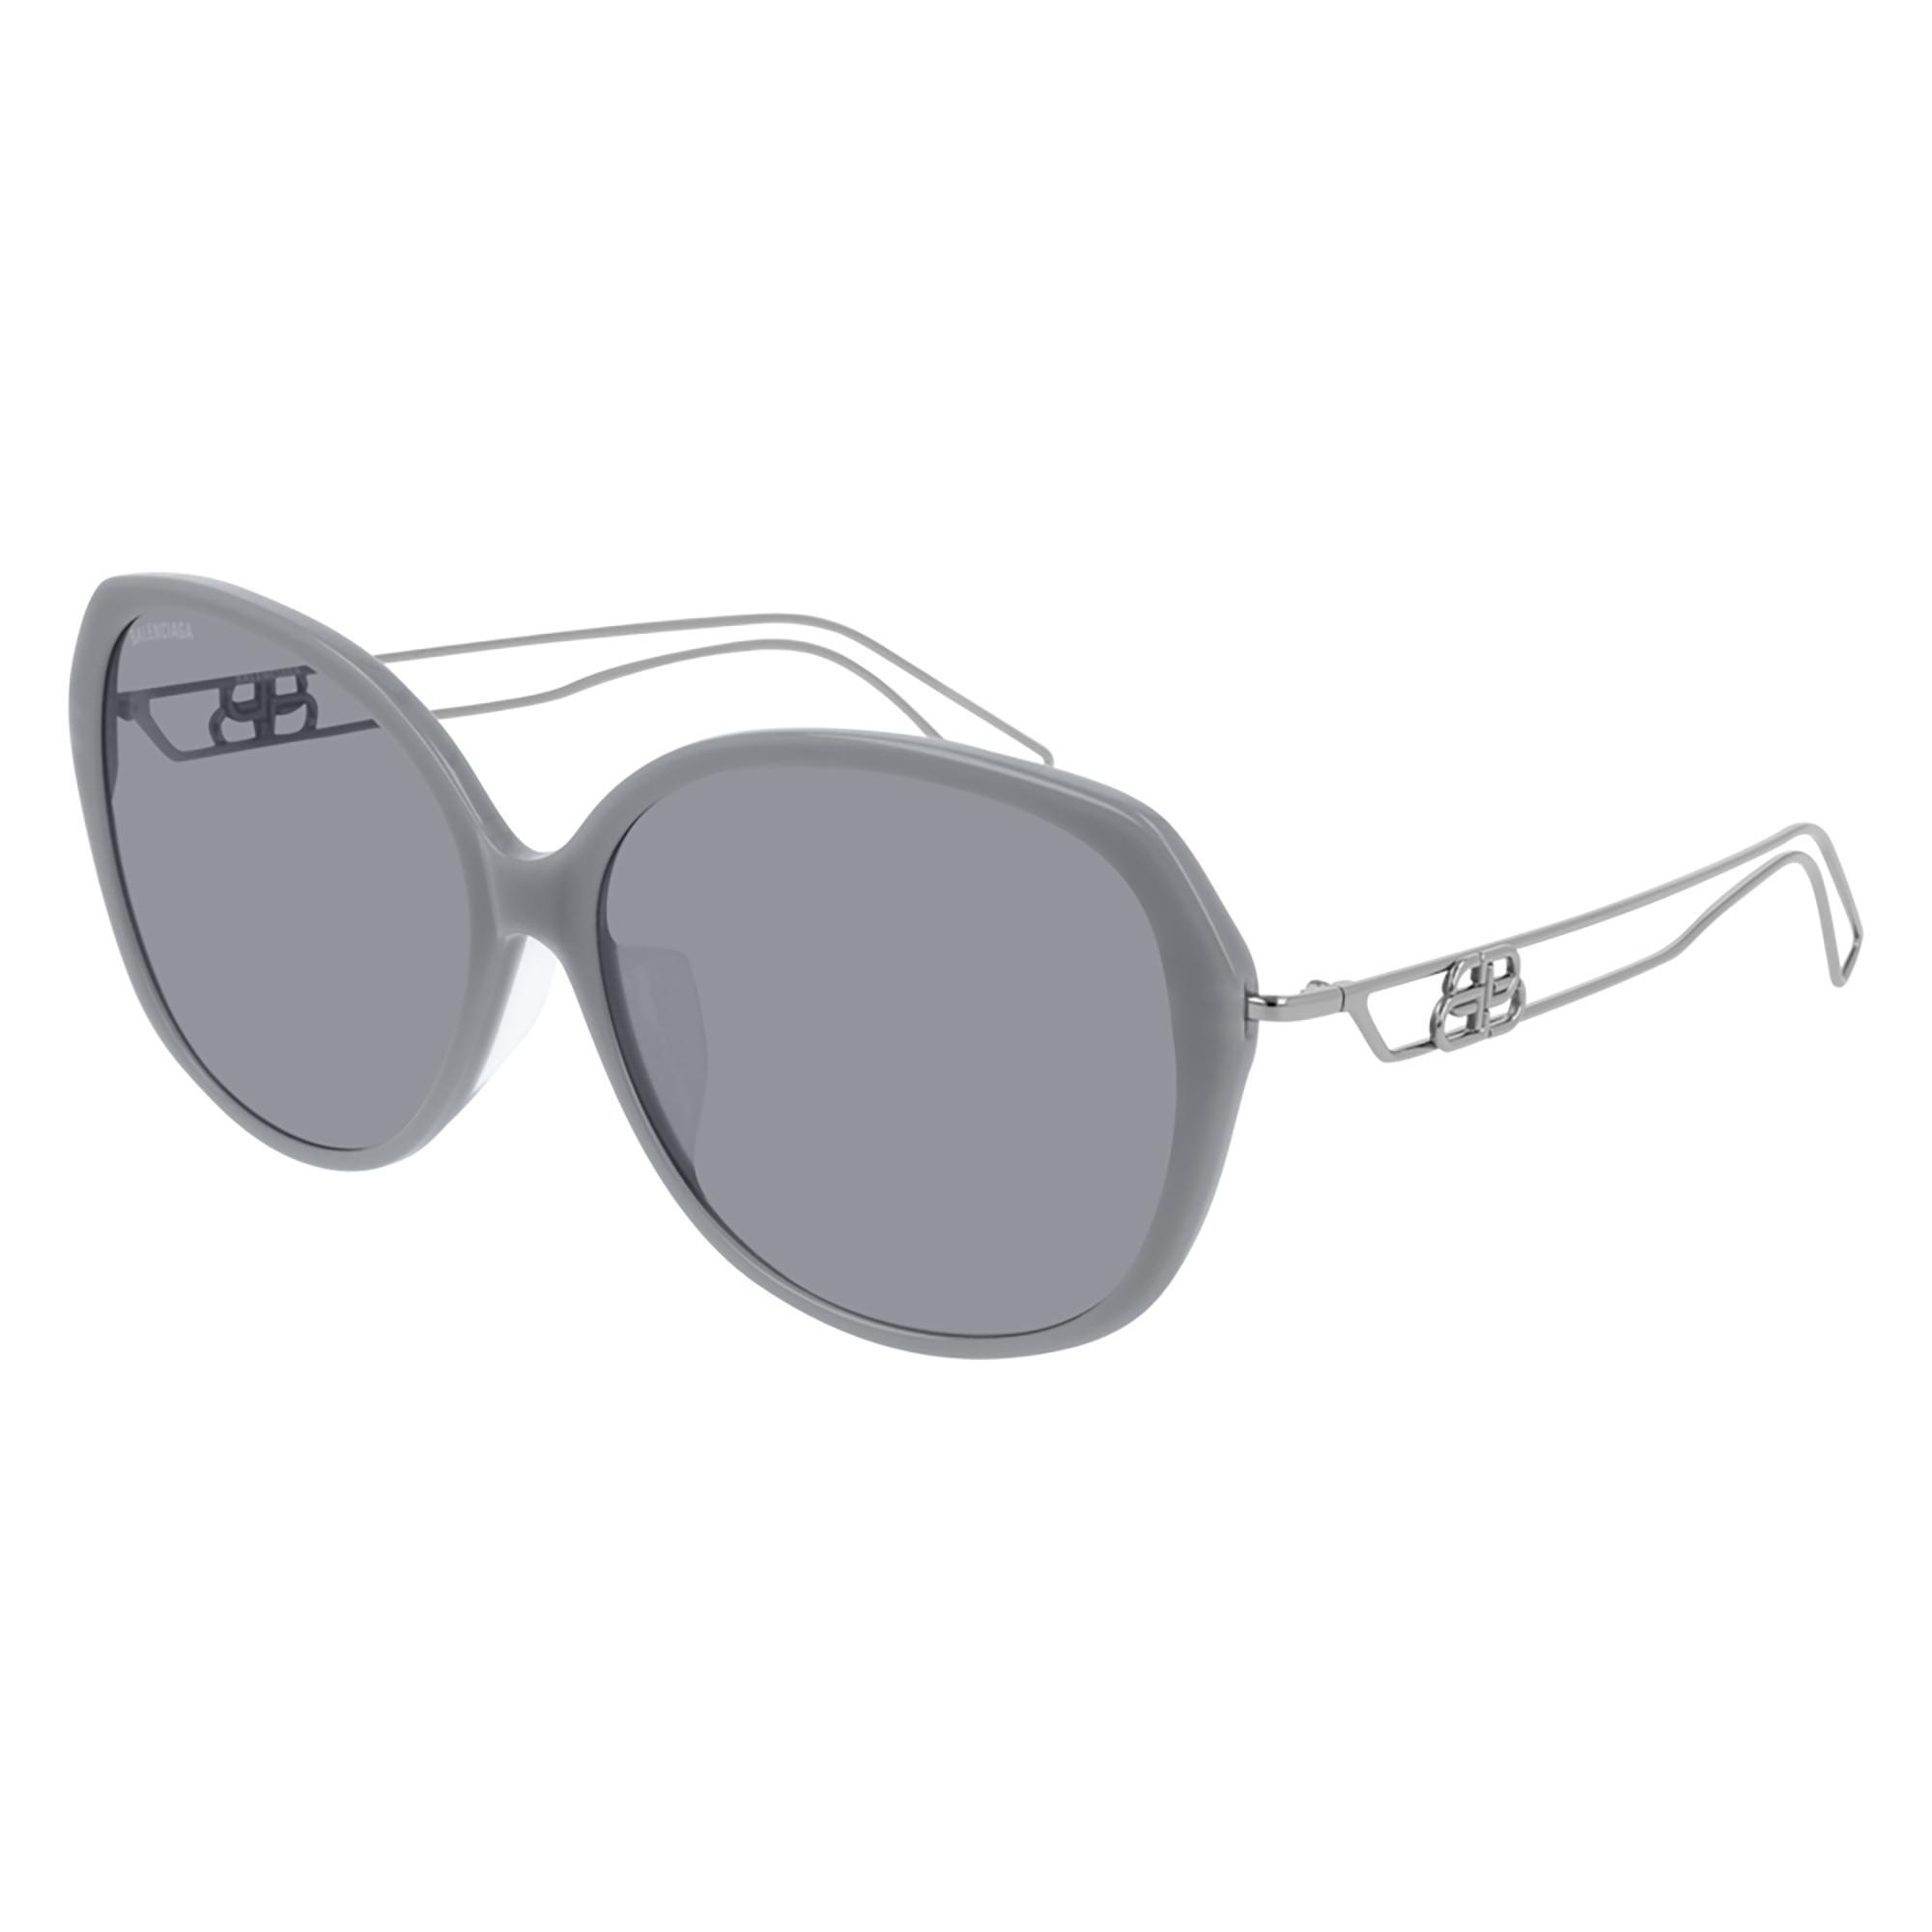 004 grey ruthenium grey